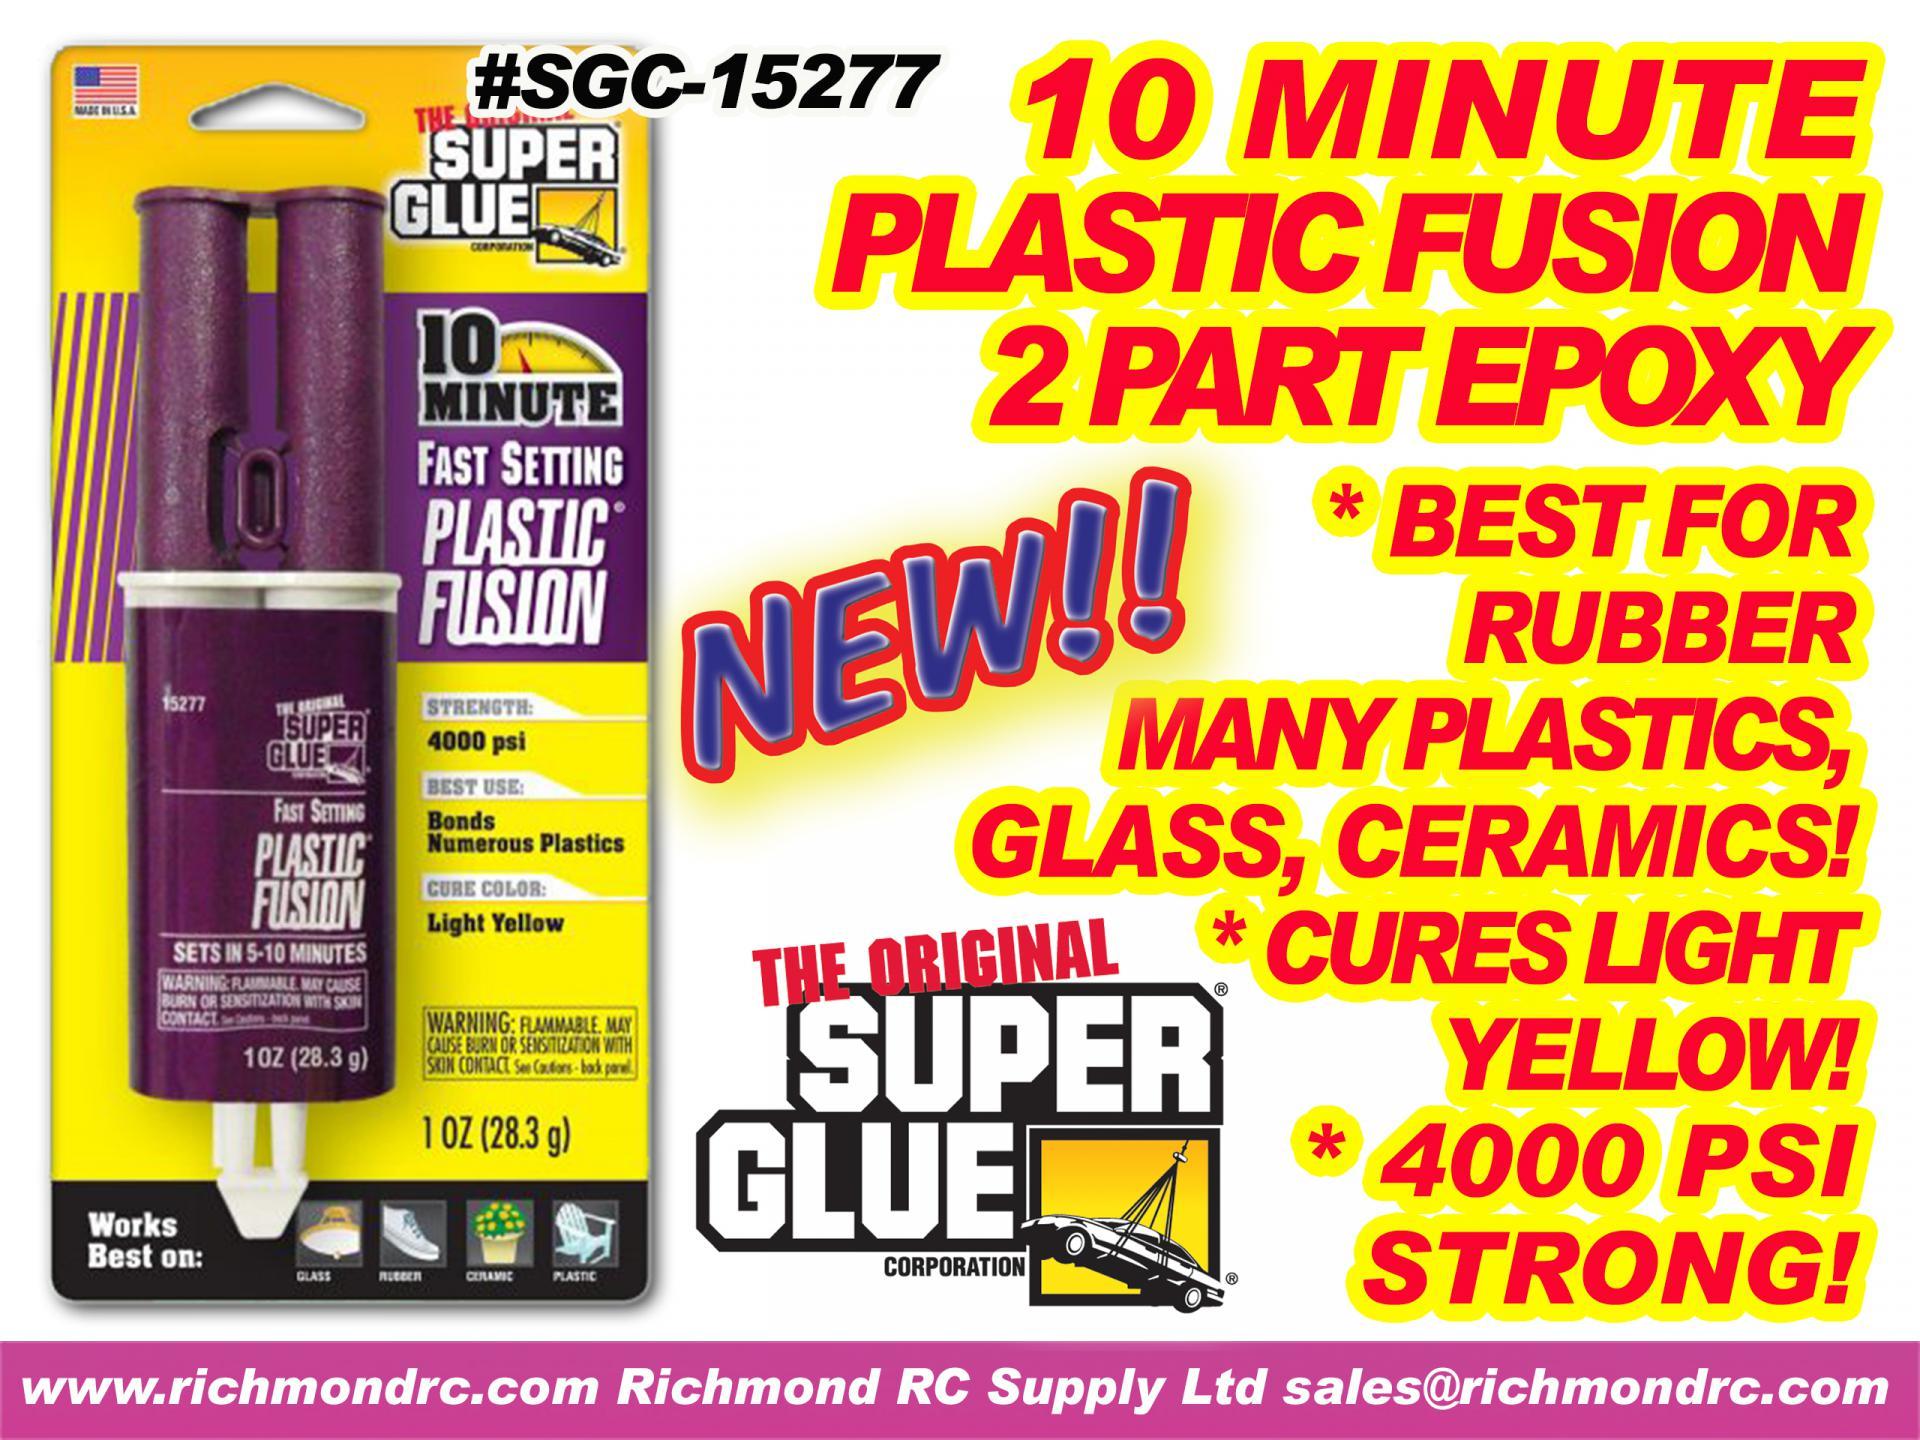 SUPER GLUE CORP - 10 MINUT PLASTC EPOXY SYRNG 28ml {pac-prices}